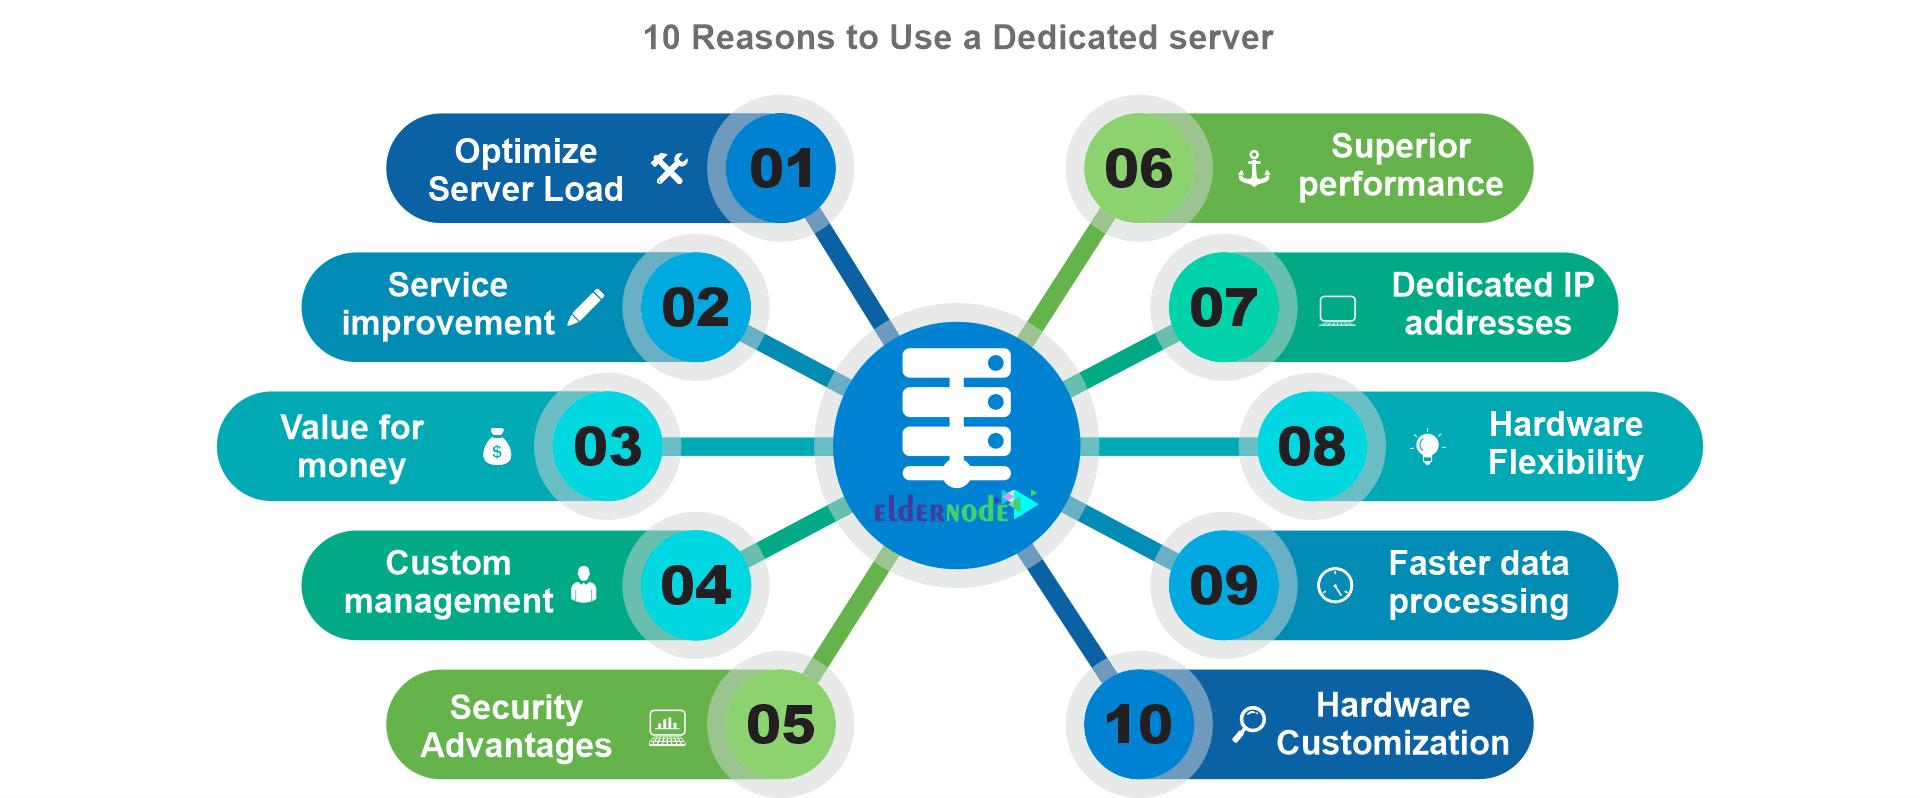 10 reason to use dedicated server